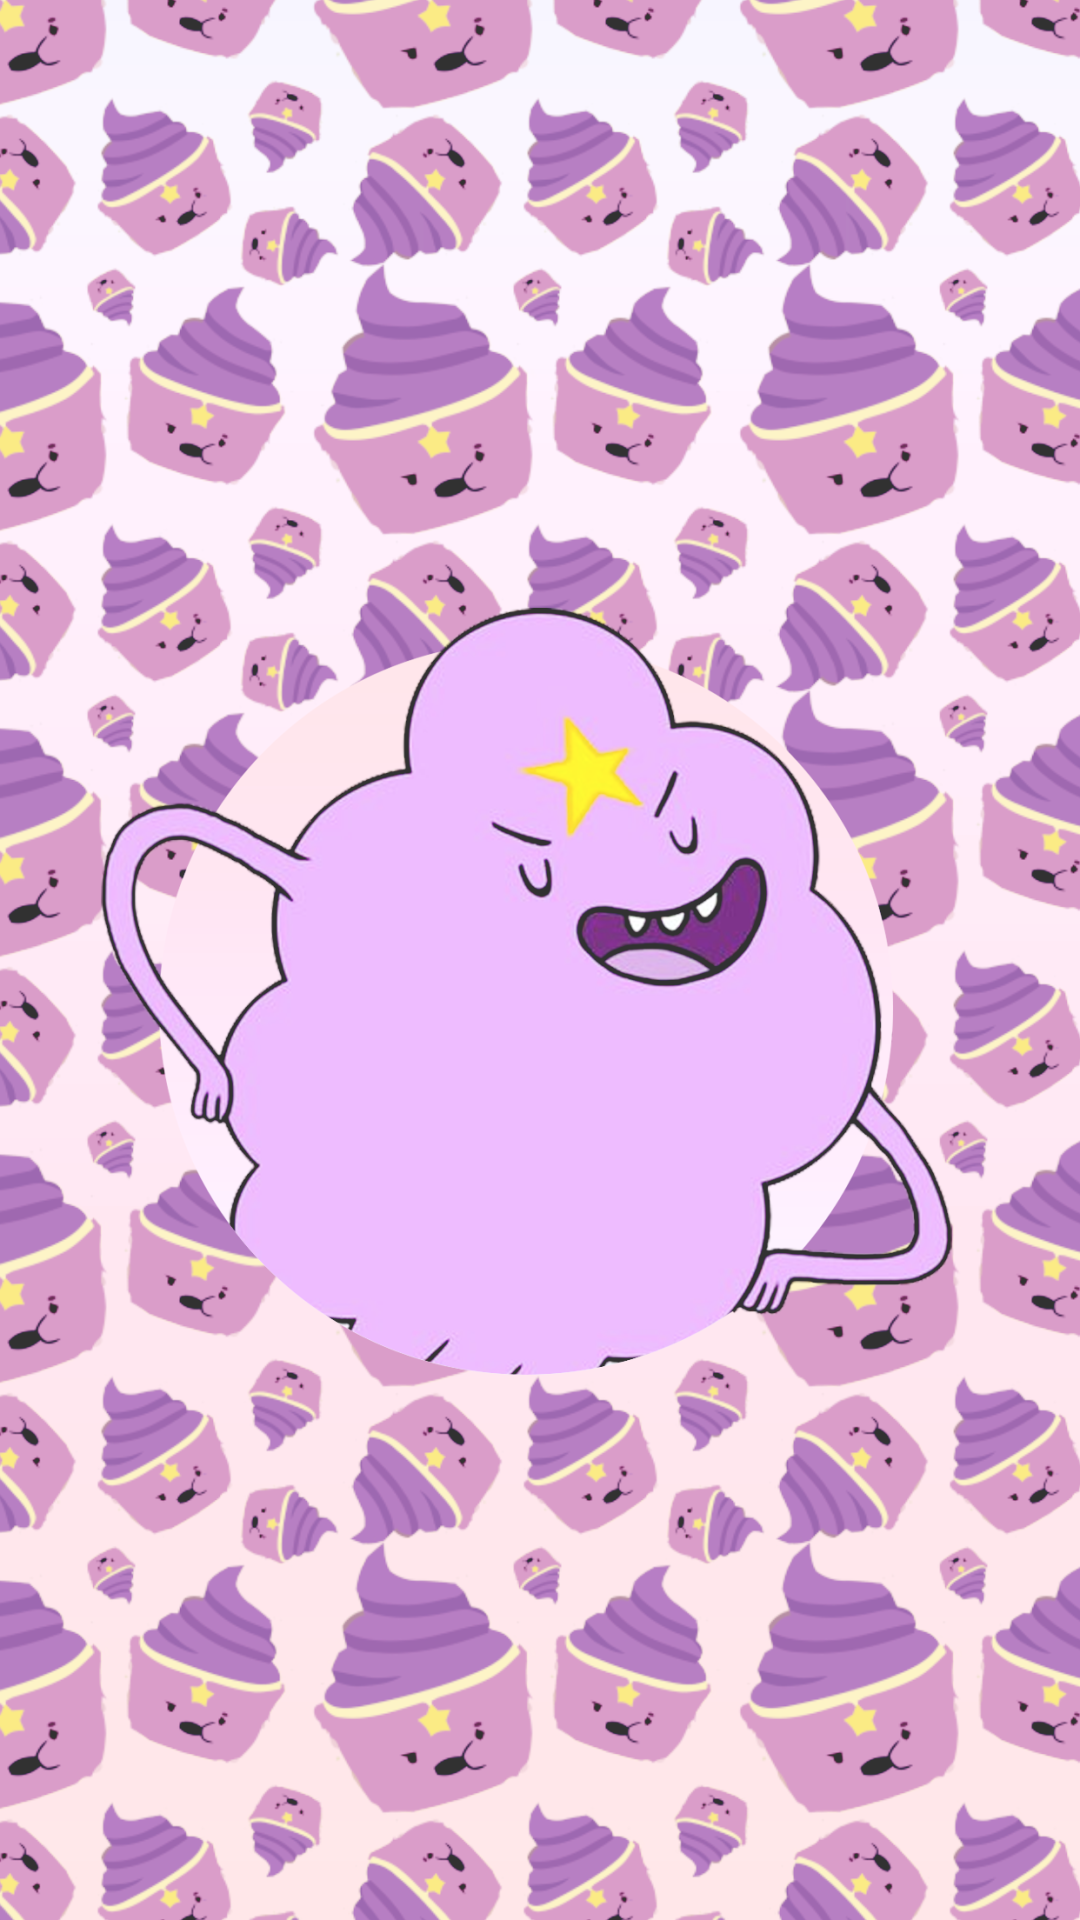 Iphone Wallpaper Tumblr Adventure Time Wallpaper Iphone Cartoon Cartoon Wallpaper